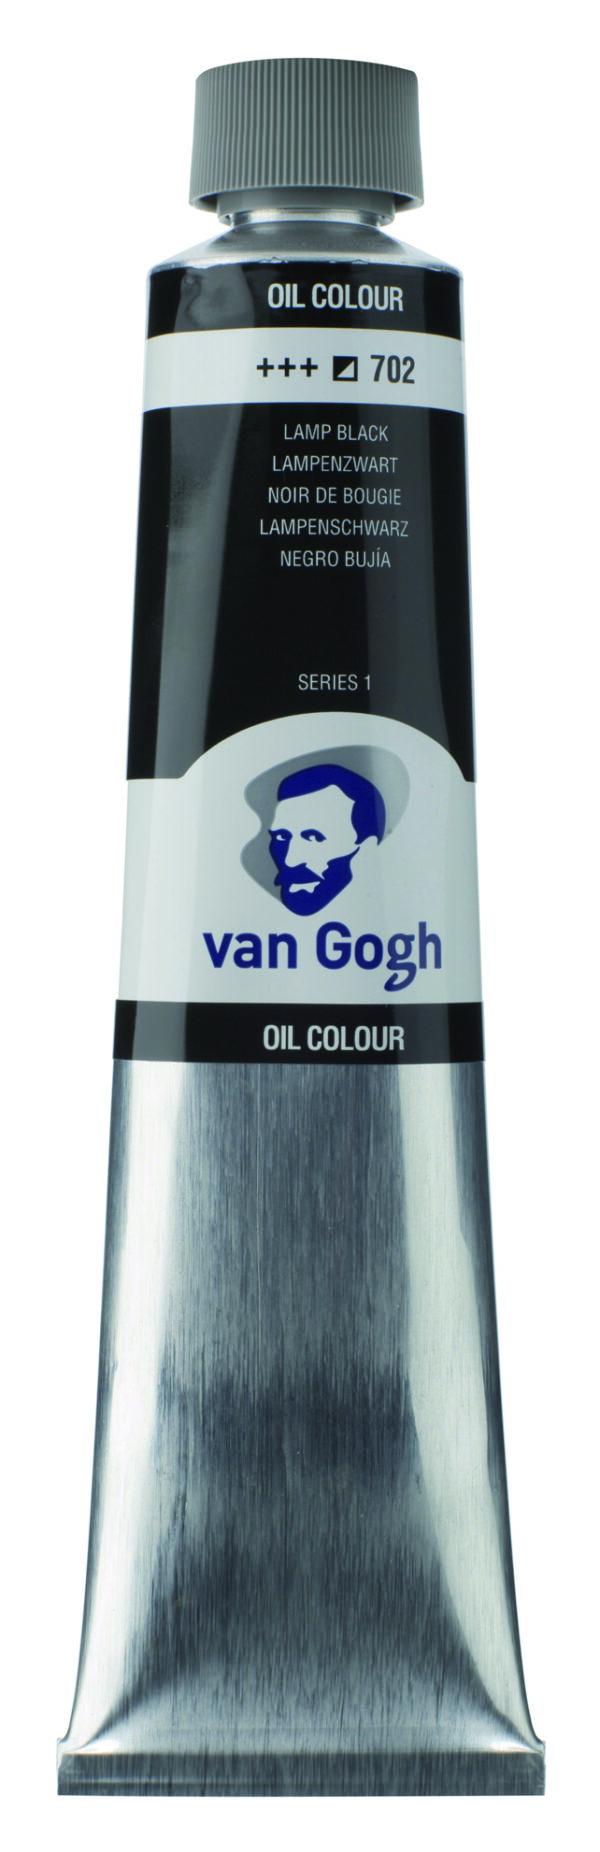 Van Gogh 702 Lamp black - 200 ml